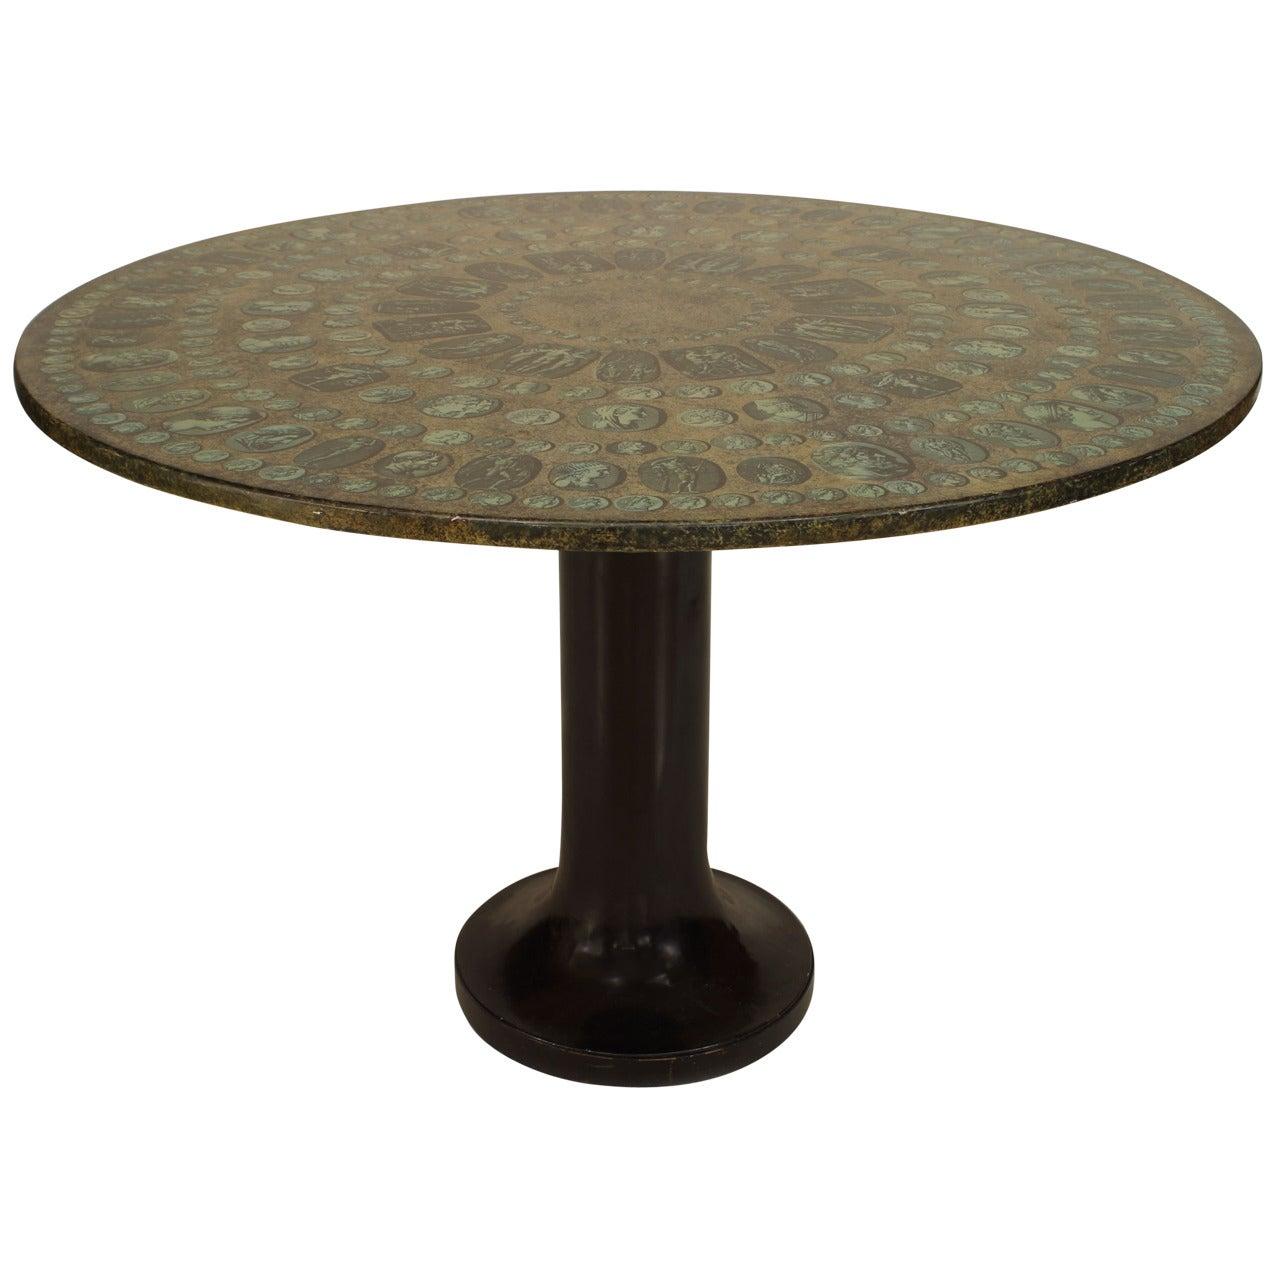 Fornasetti Ebonized Medallion Dining Table